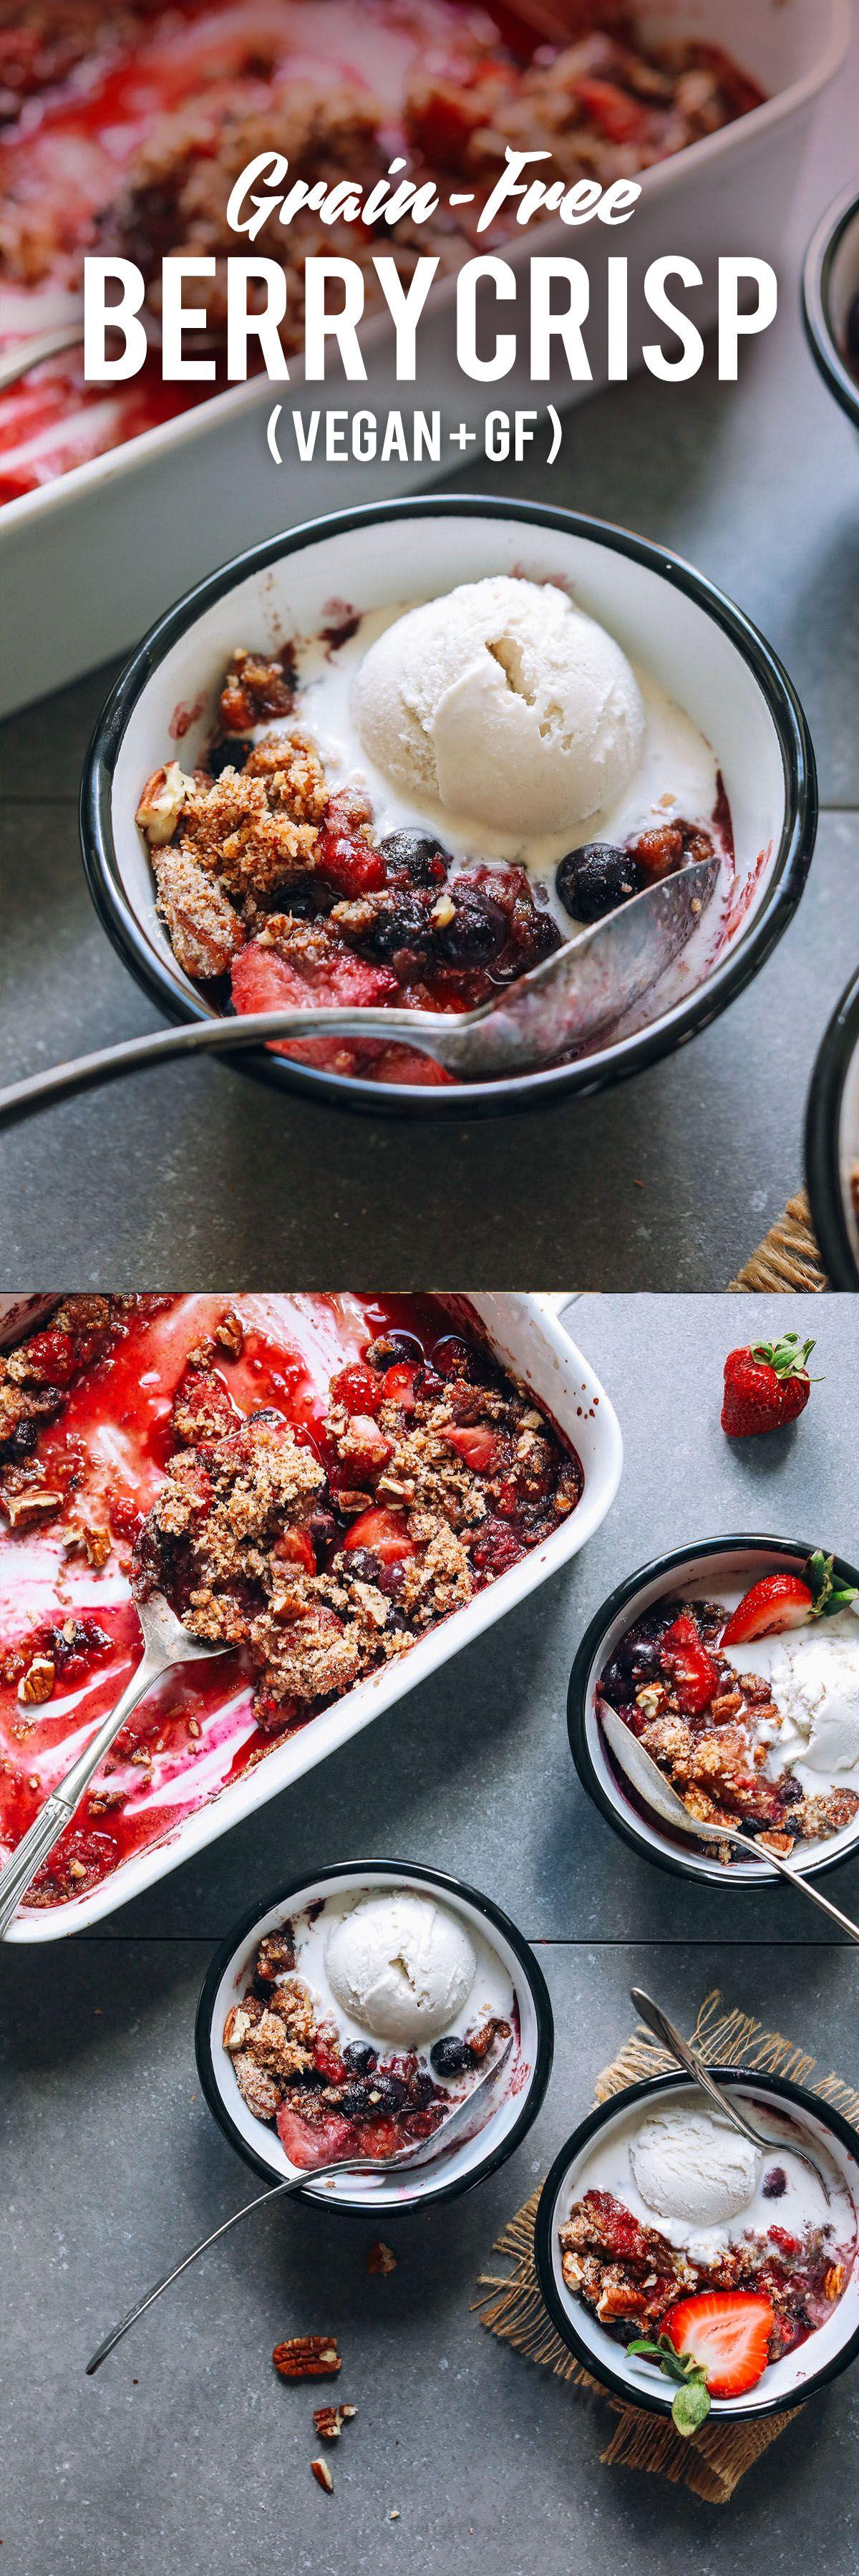 Grain Free Vegan Berry Crisp Minimalist Baker Recipes Recipe Berry Crisp Recipes Food